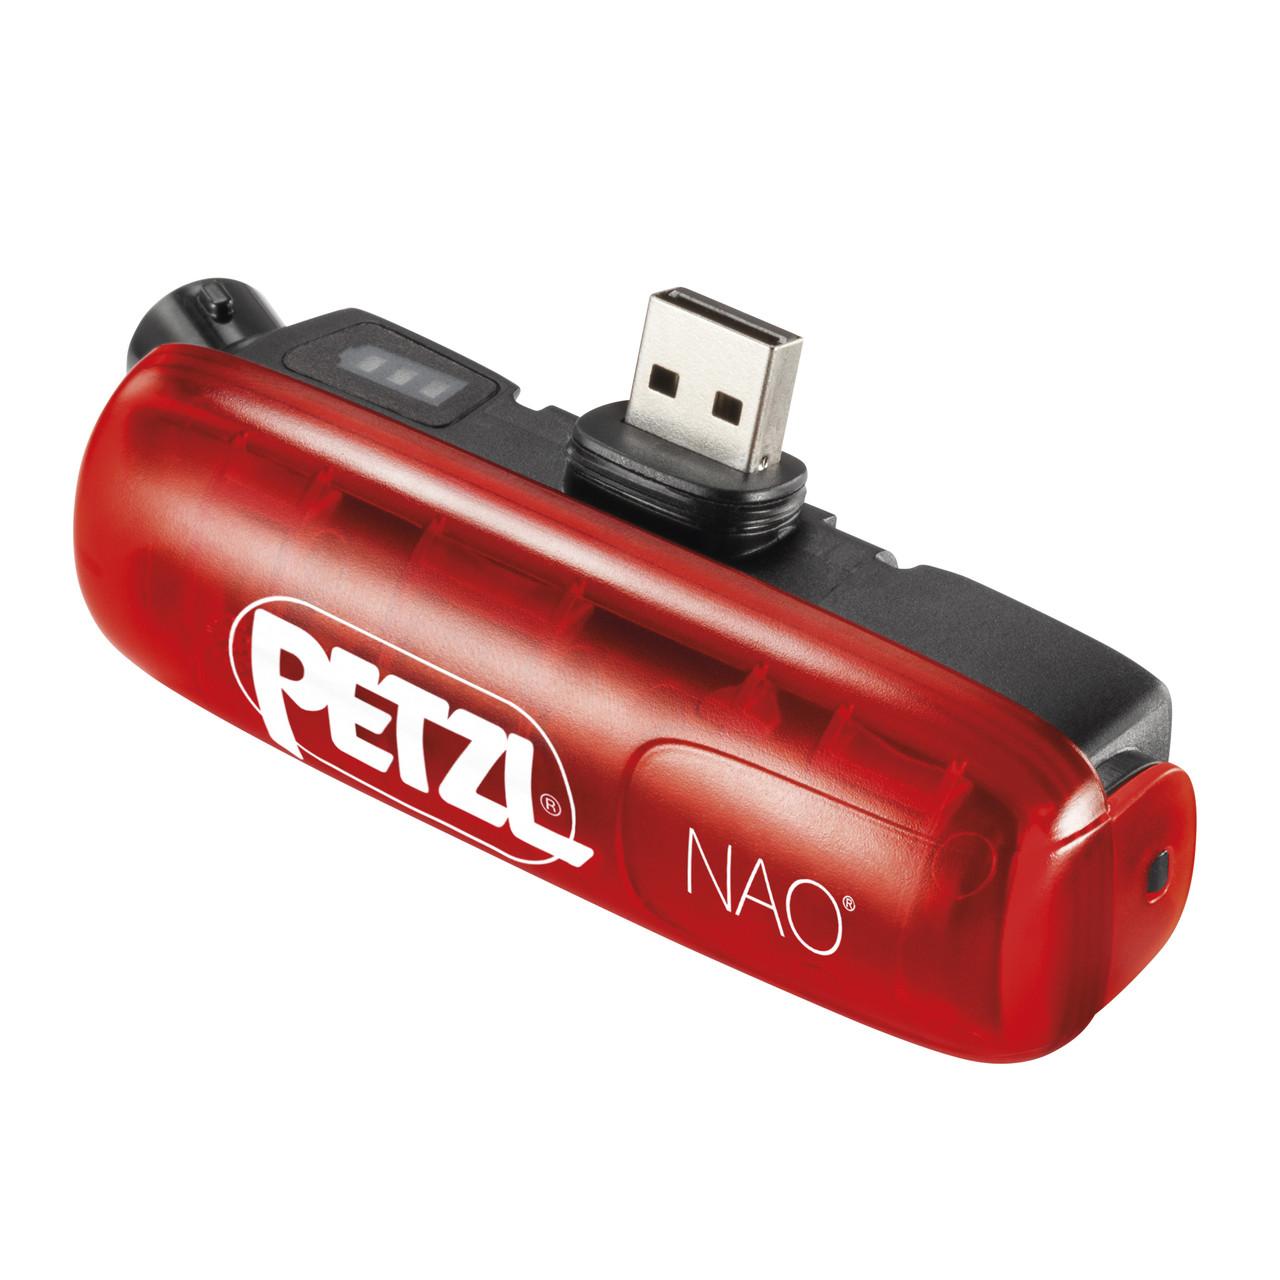 NEW Petzl Core Rechargable Battery Lithium-Ion 1250 mAh With USB Port E99ACA